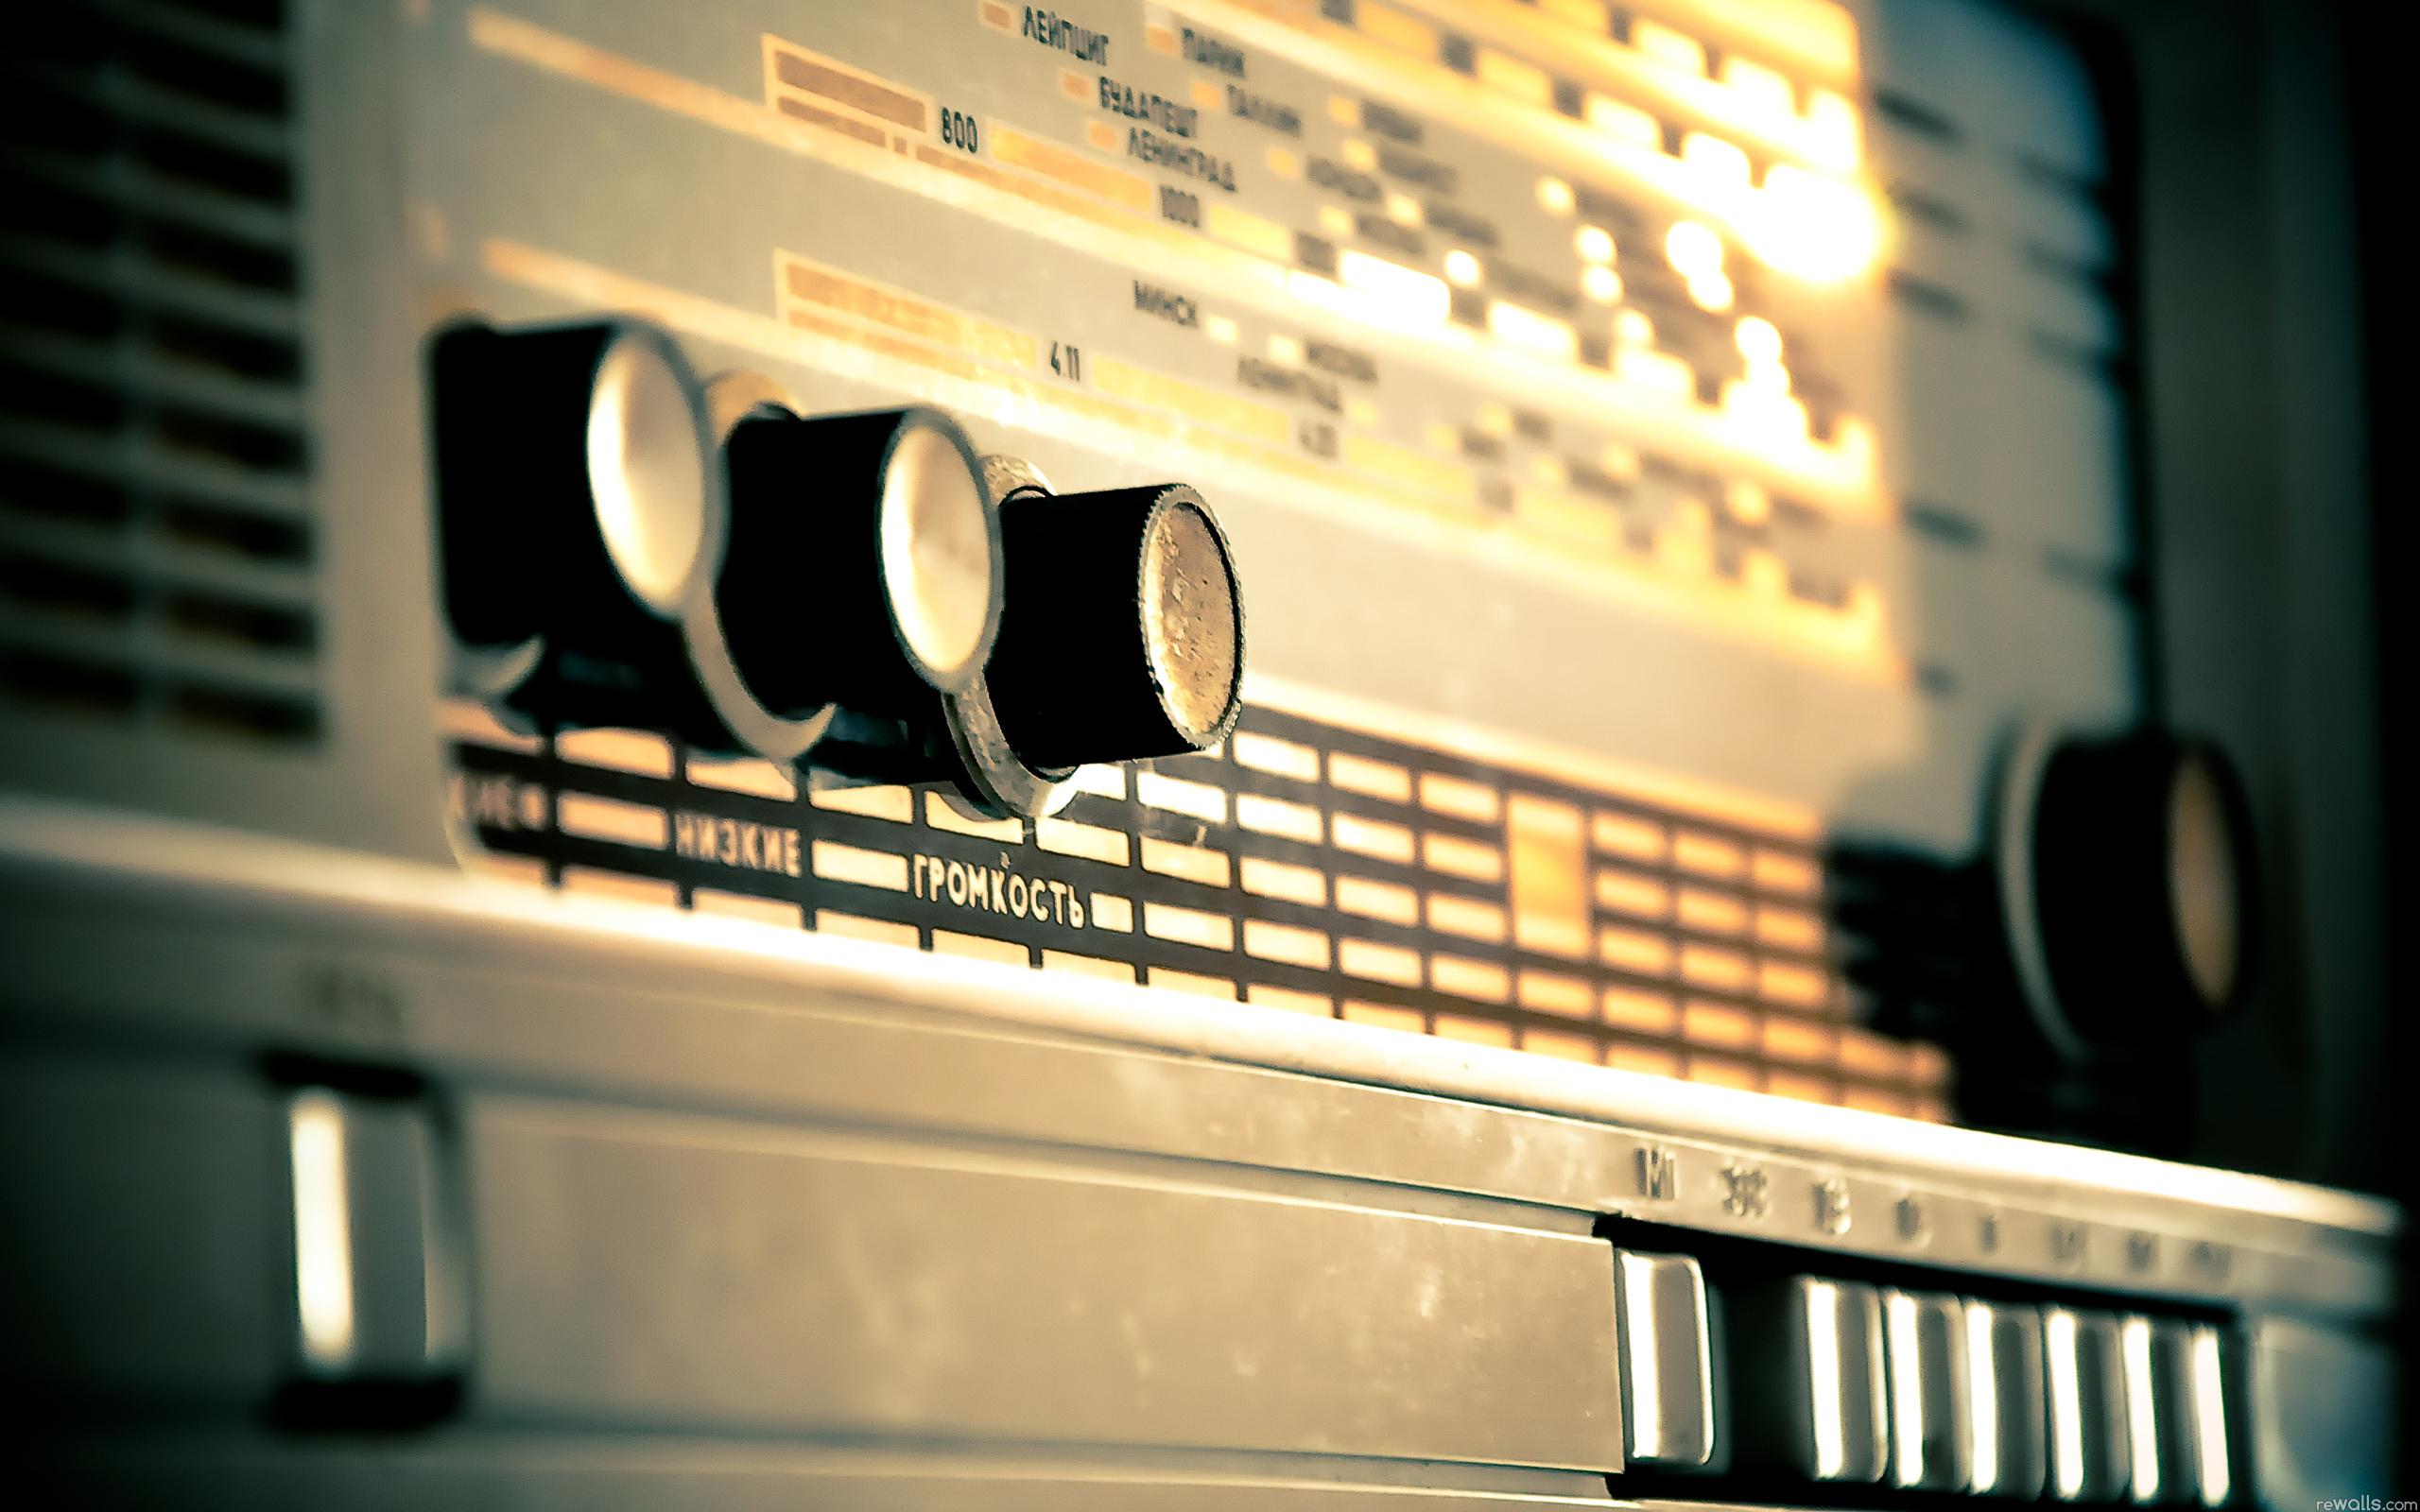 Популярноли сейчас радио?